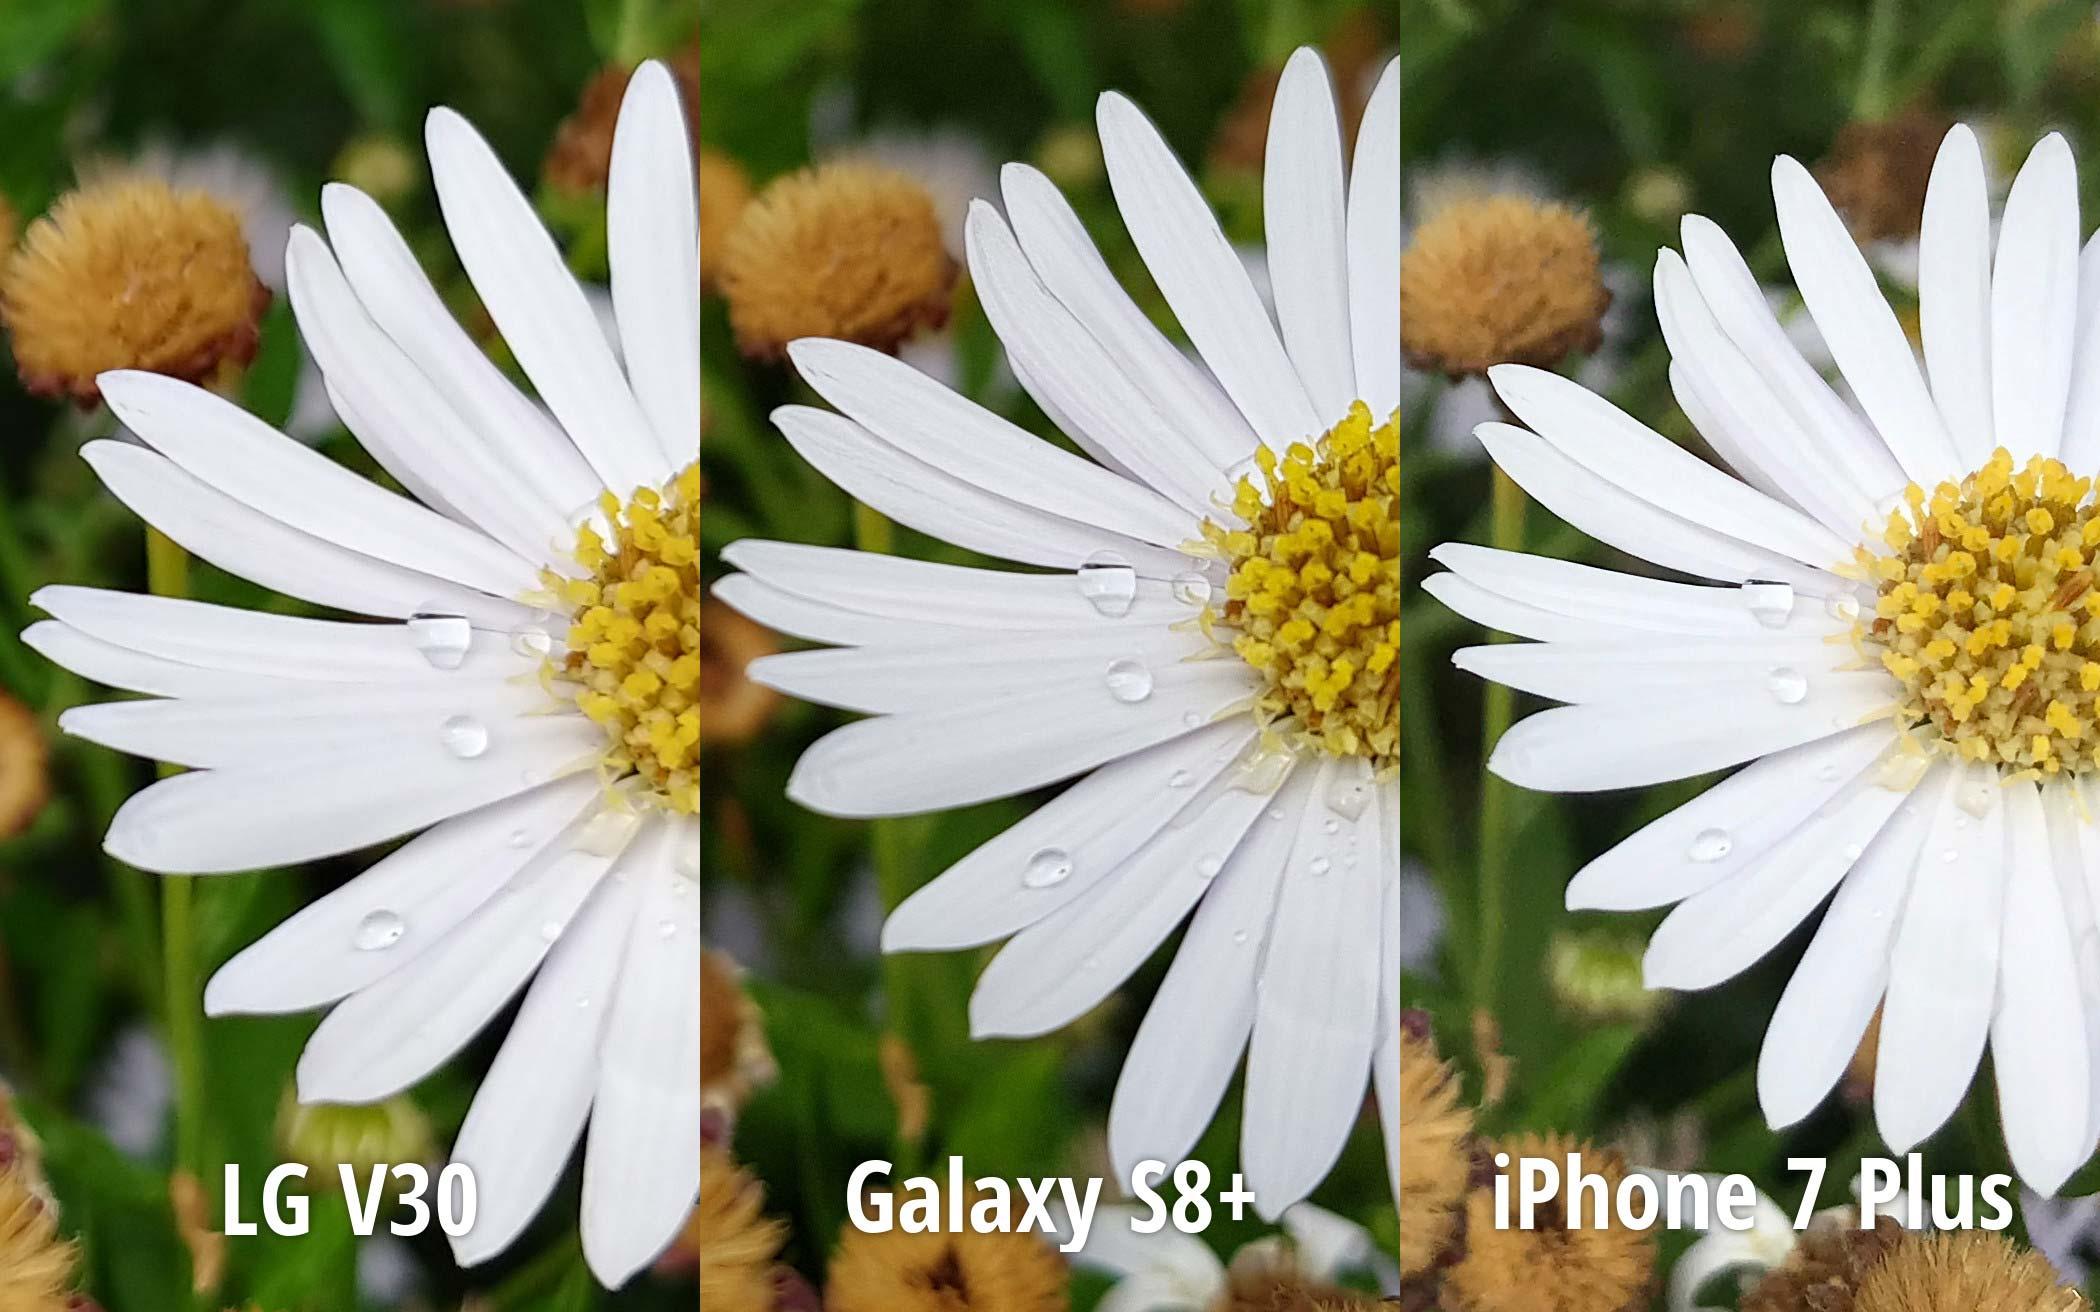 LG-V30-vs-Galaxy-S8-vs-iPhone-7-Plus-camera-photo-samples.jpg